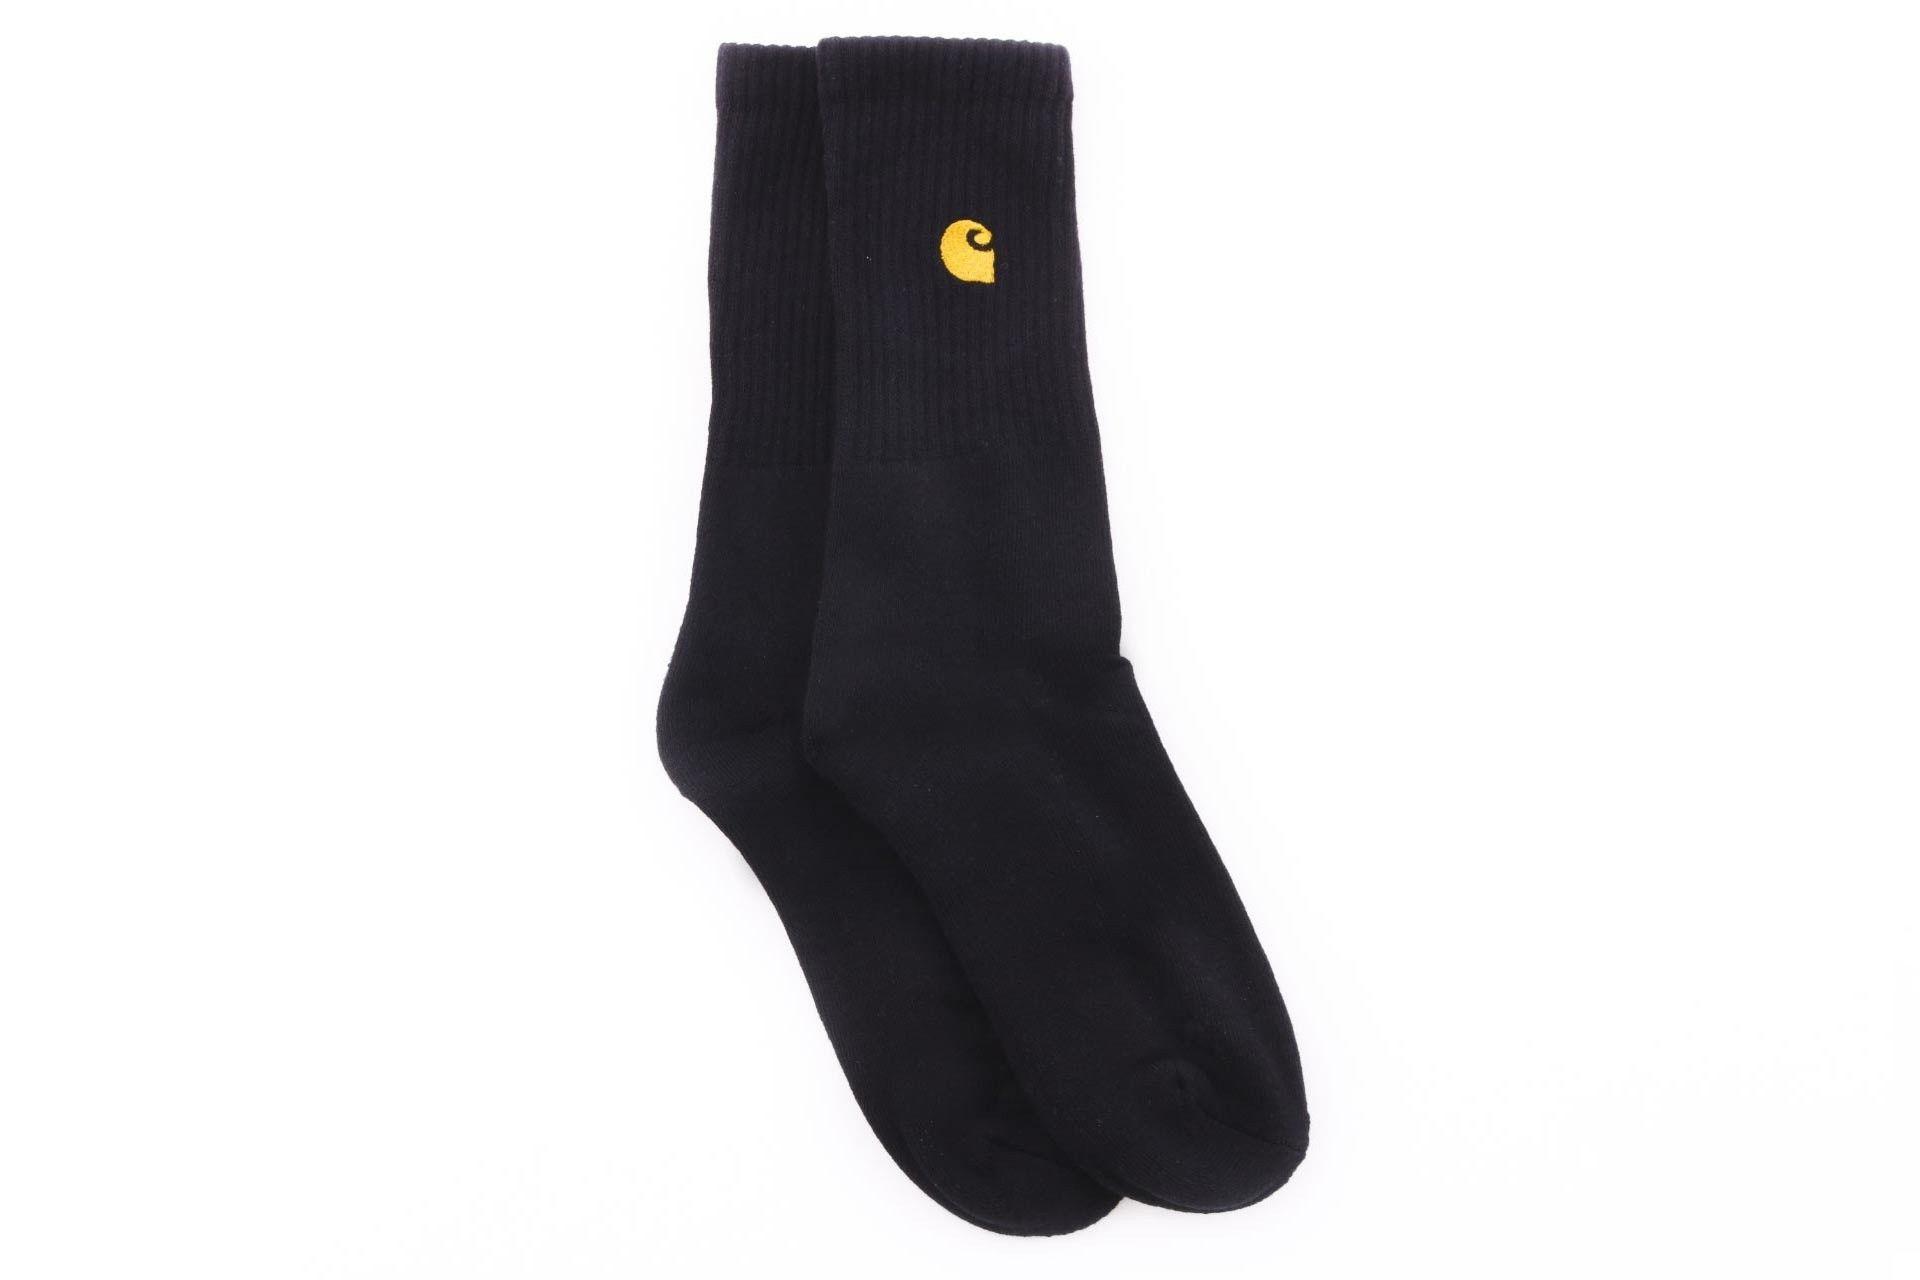 Afbeelding van Carhartt Wip Chase Socks I026527 Sokken Black / Gold